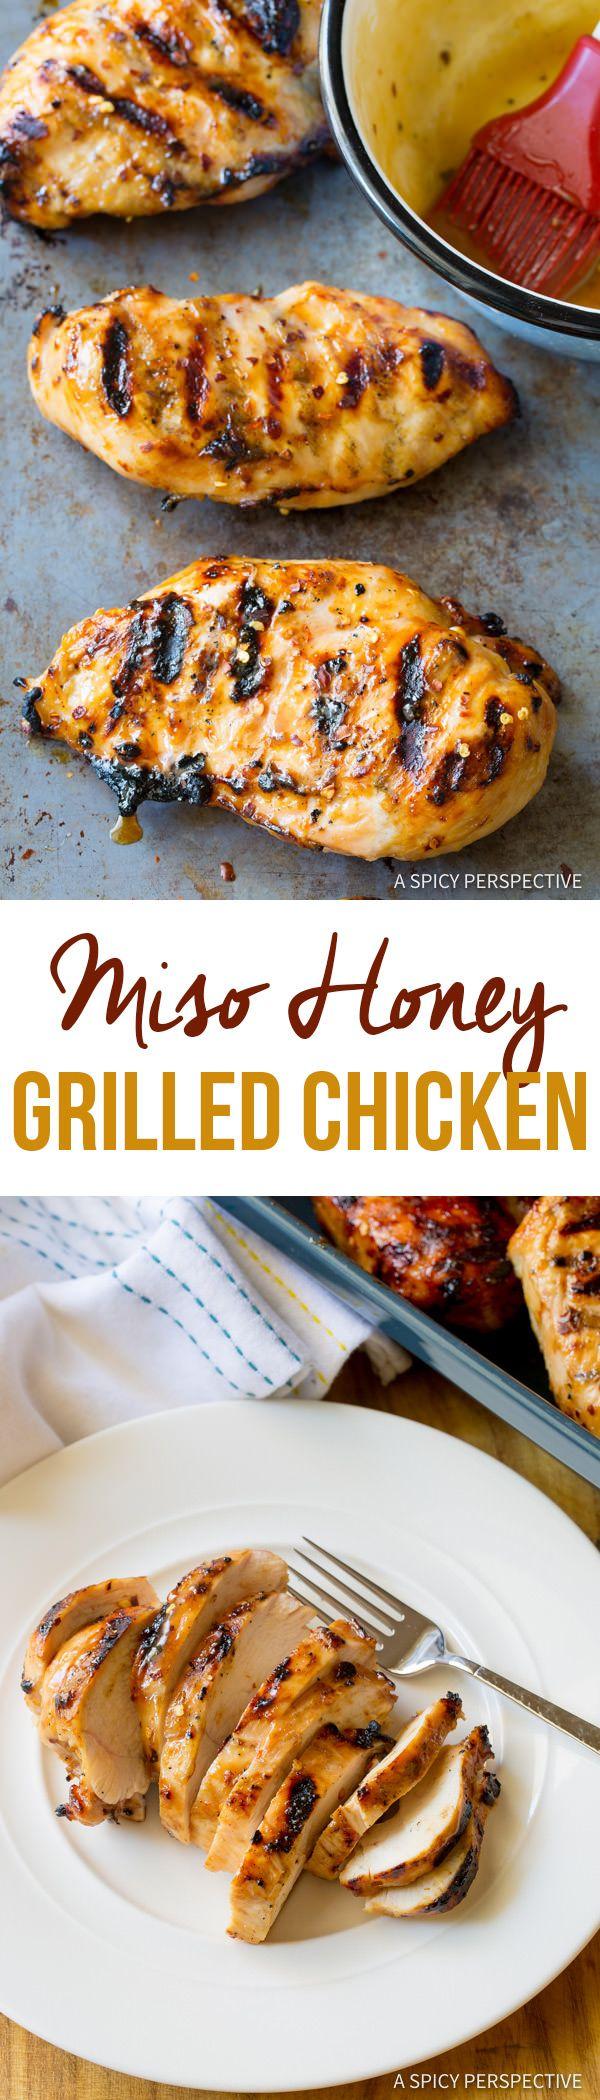 Grilled Miso Honey Chicken Recipe | ASpicyPerspective.com